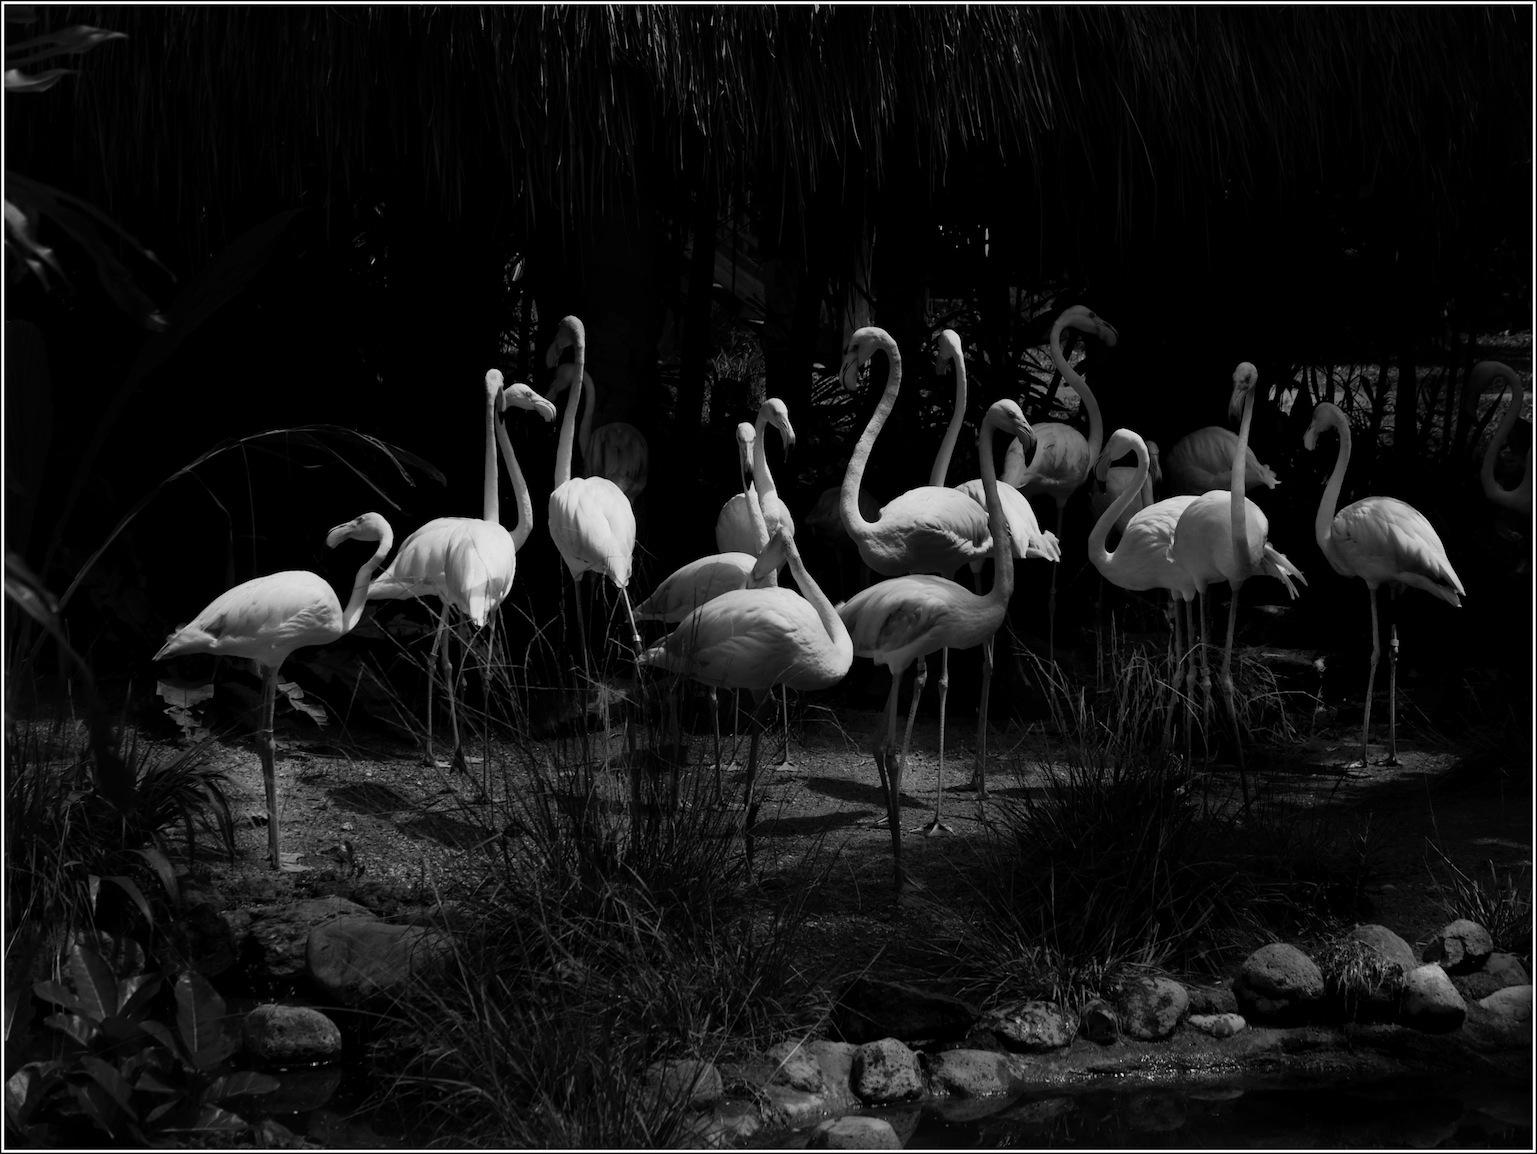 Birds in Bali 8 by kevinmfairley